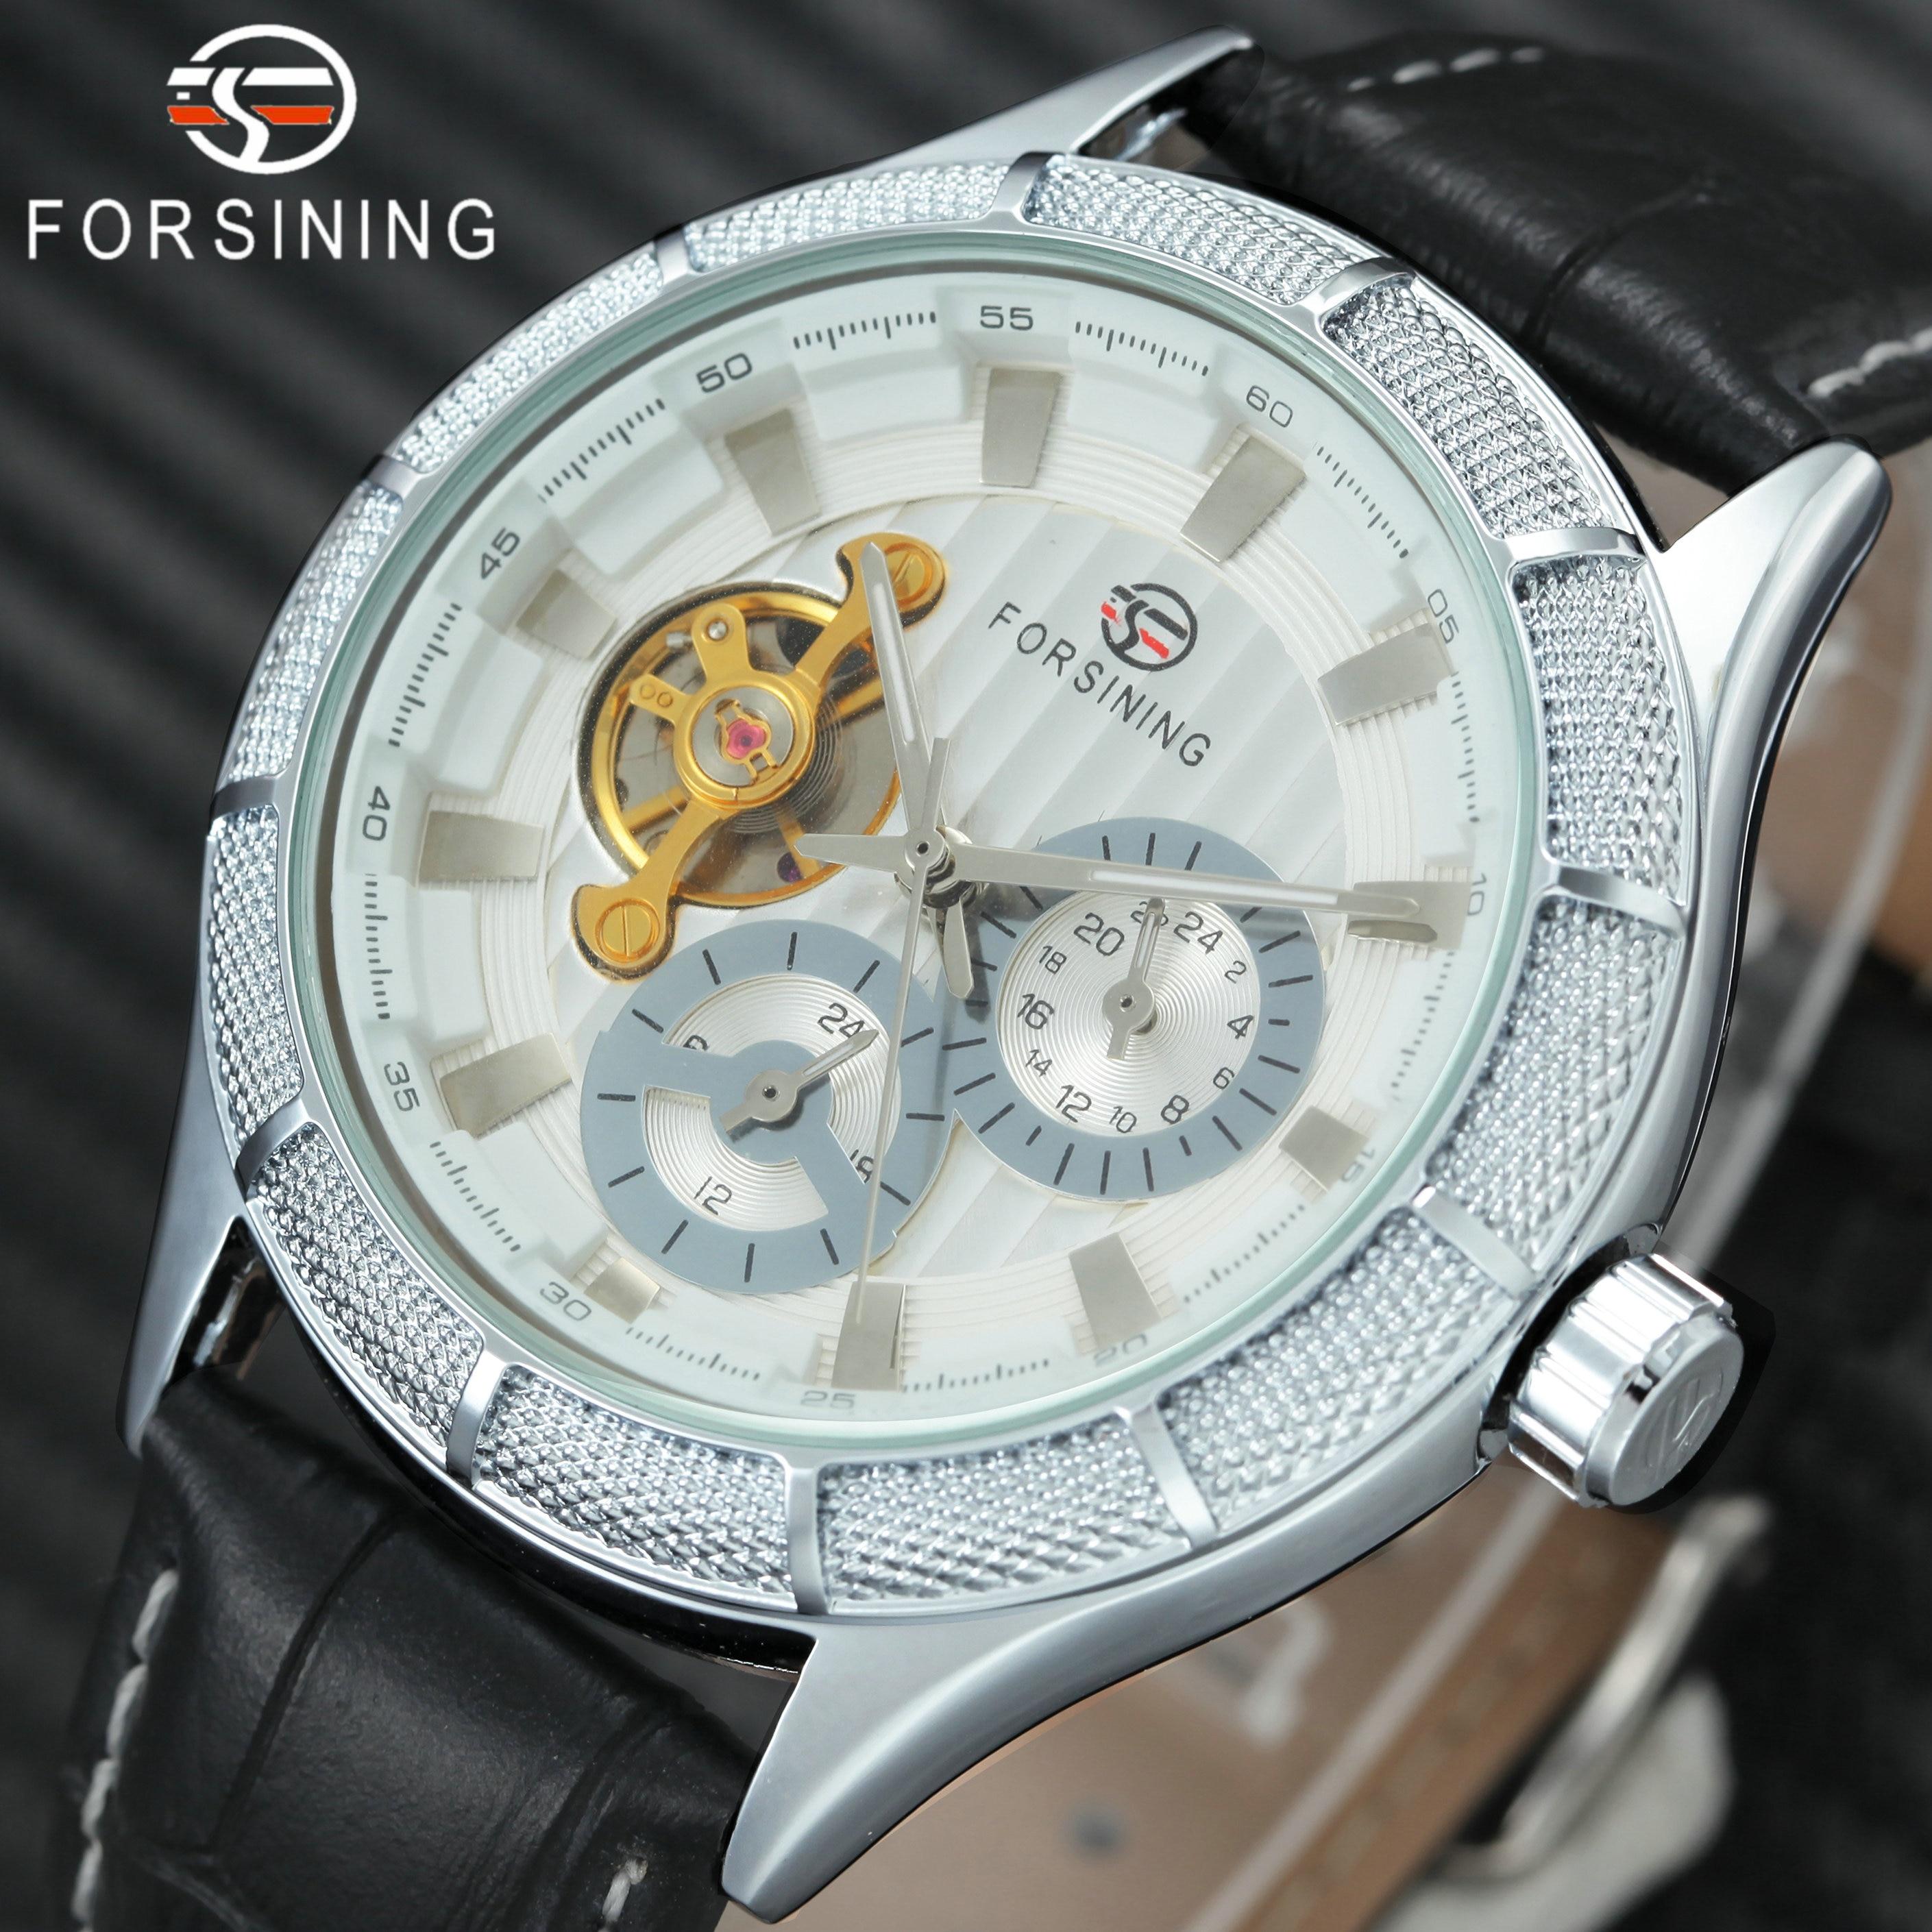 цена на FORSINING Top Brand Luxury Tourbillon Skeleton Mechanical Watch Men Leather Strap 2 Sub-dials Fashion Classic Wrist Watches 2018